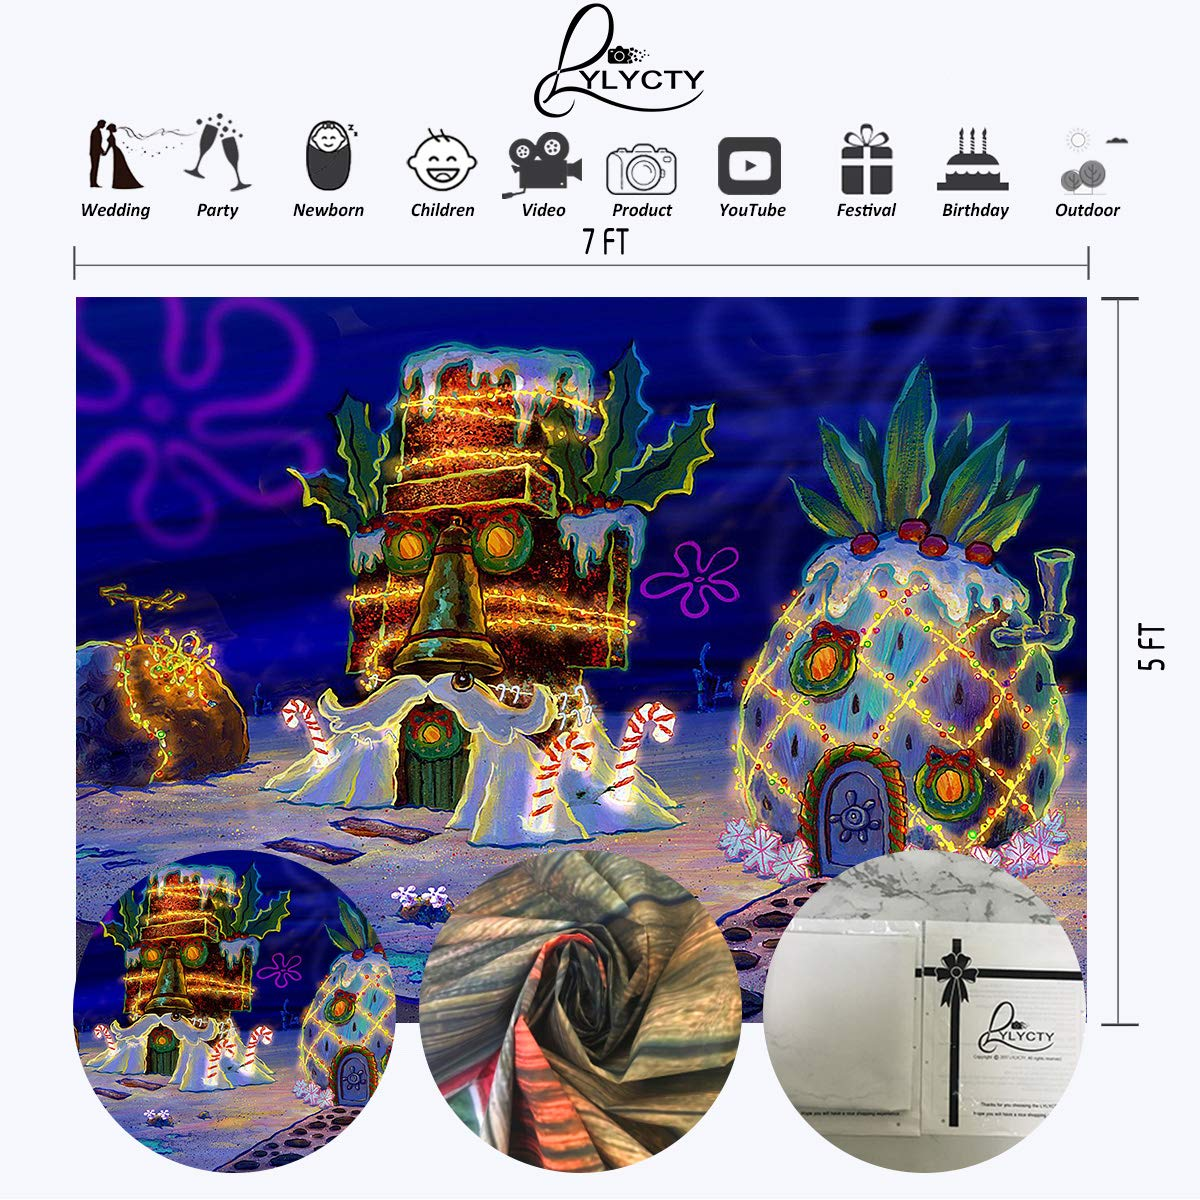 Amazon.com: LYLYCTY - Fondo de Bob Esponja de 7 x 5 pies ...